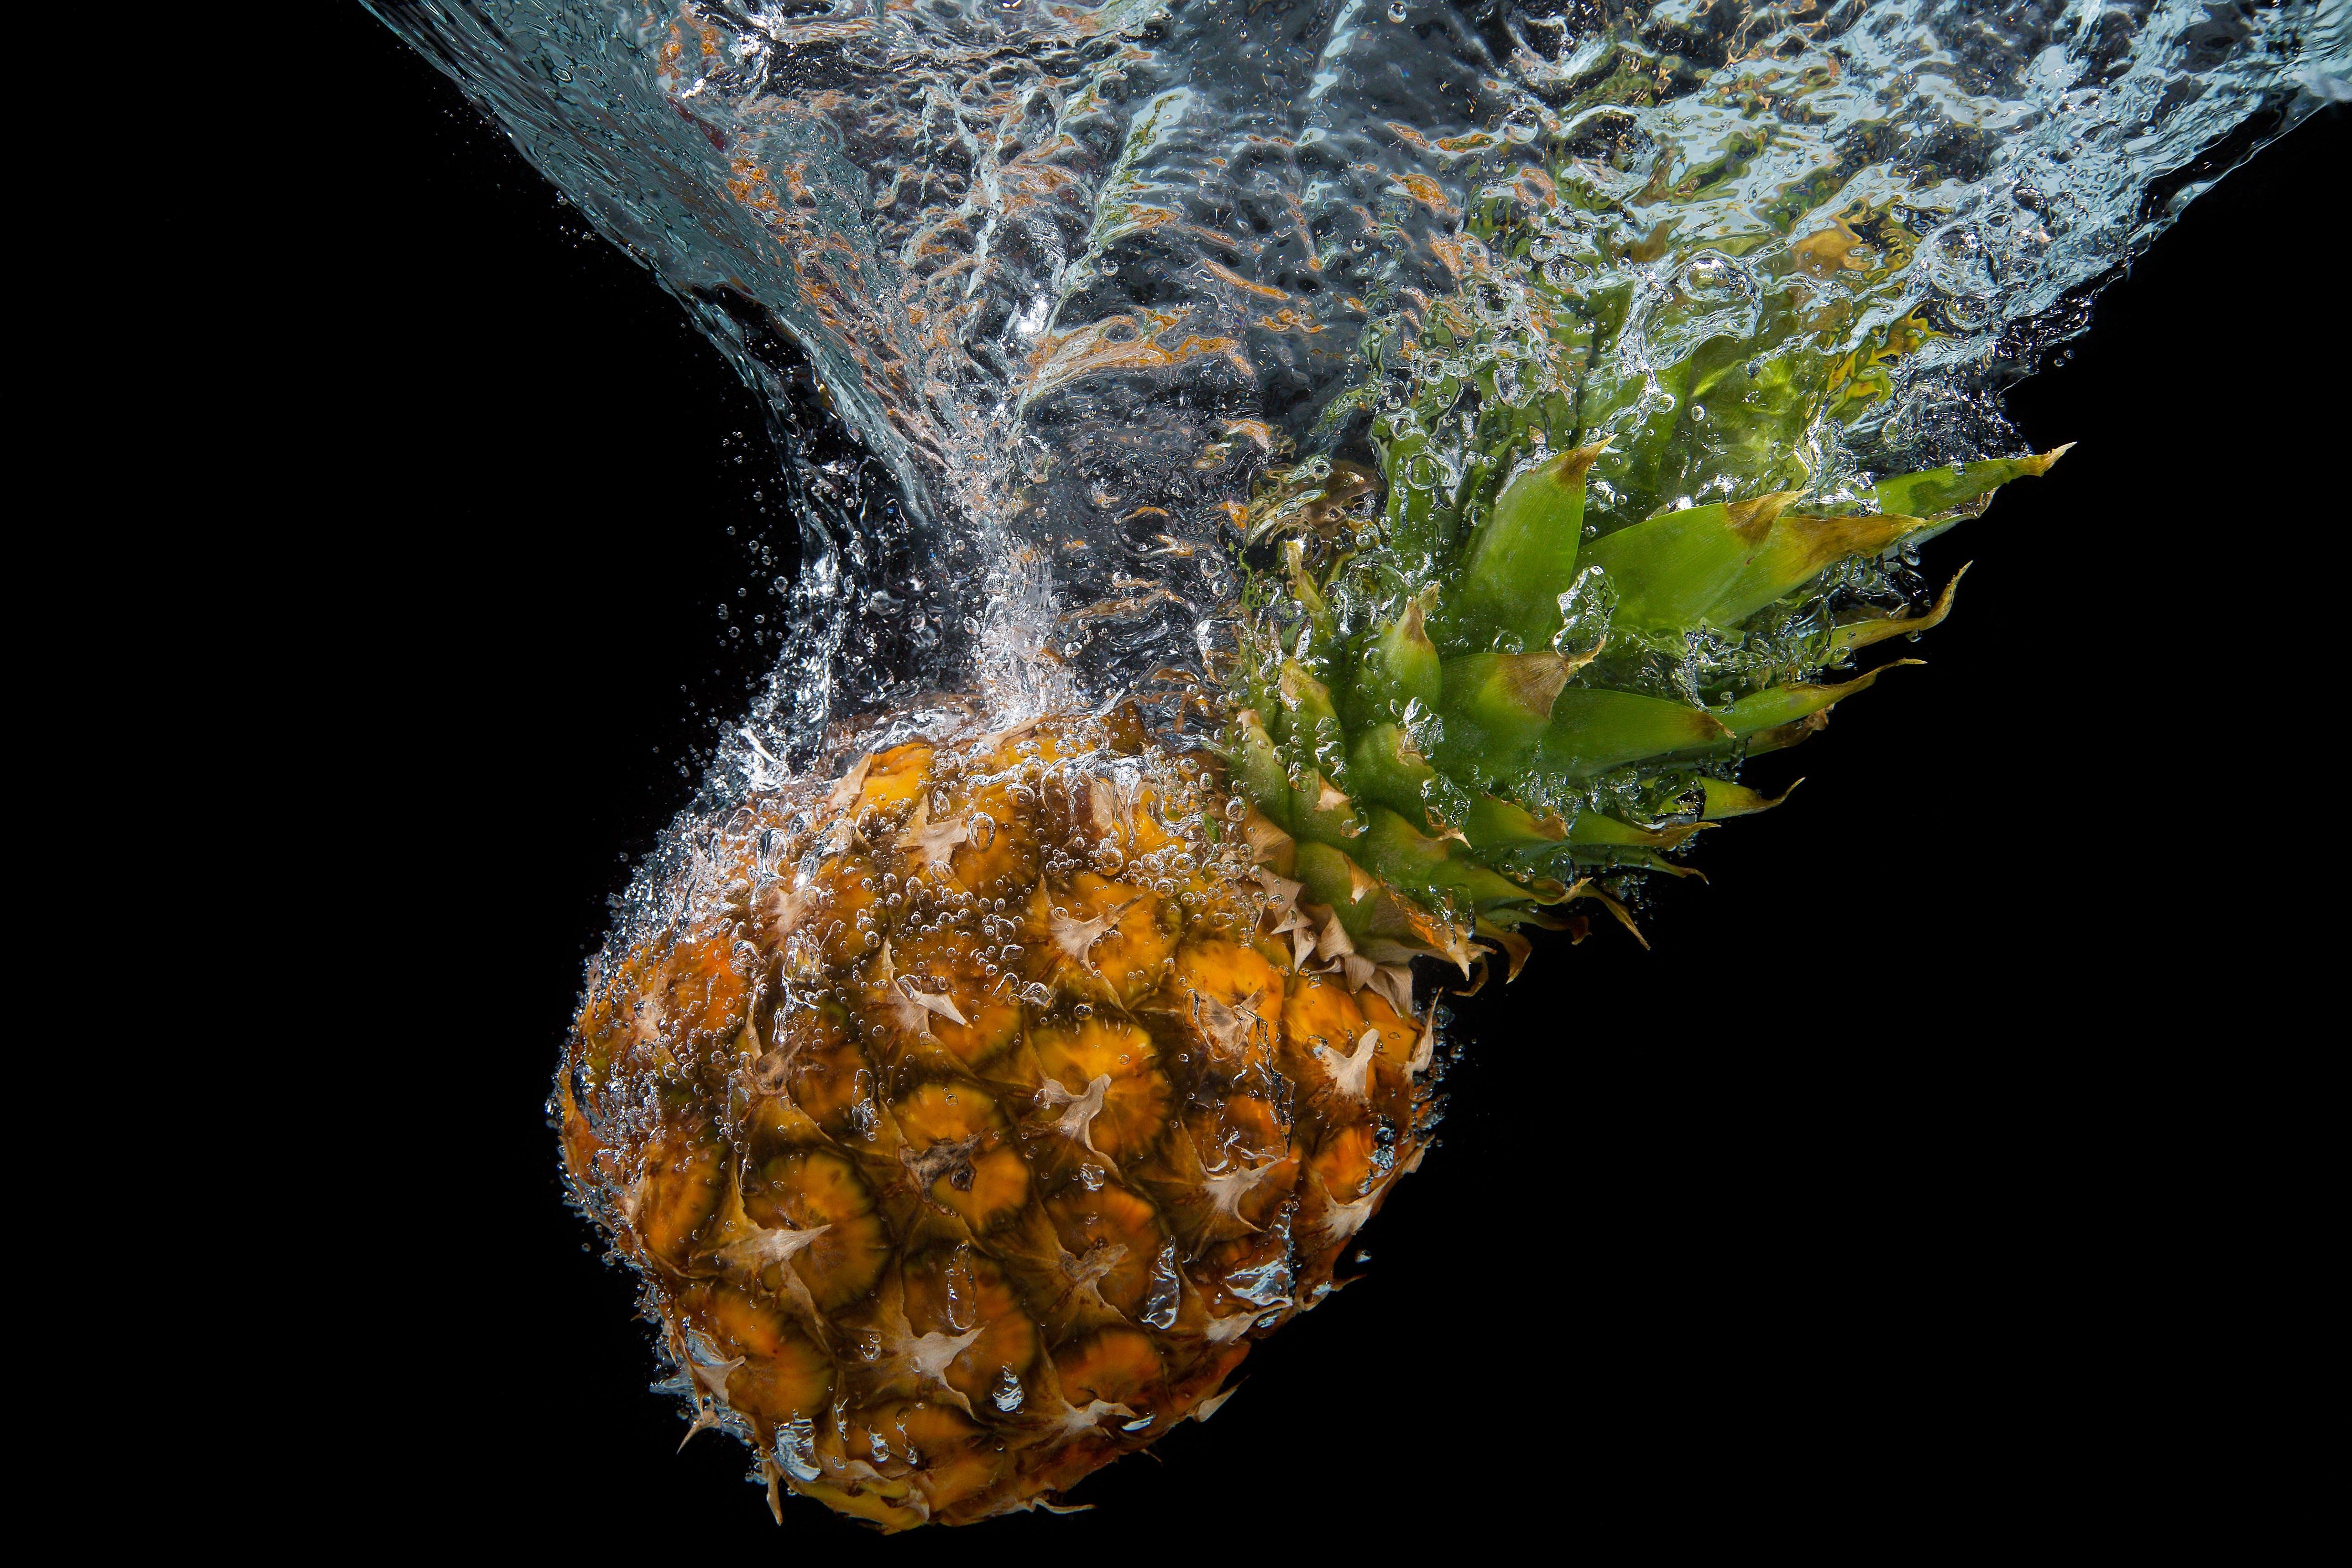 Free stock photo of water, drop of water, macro, fruit